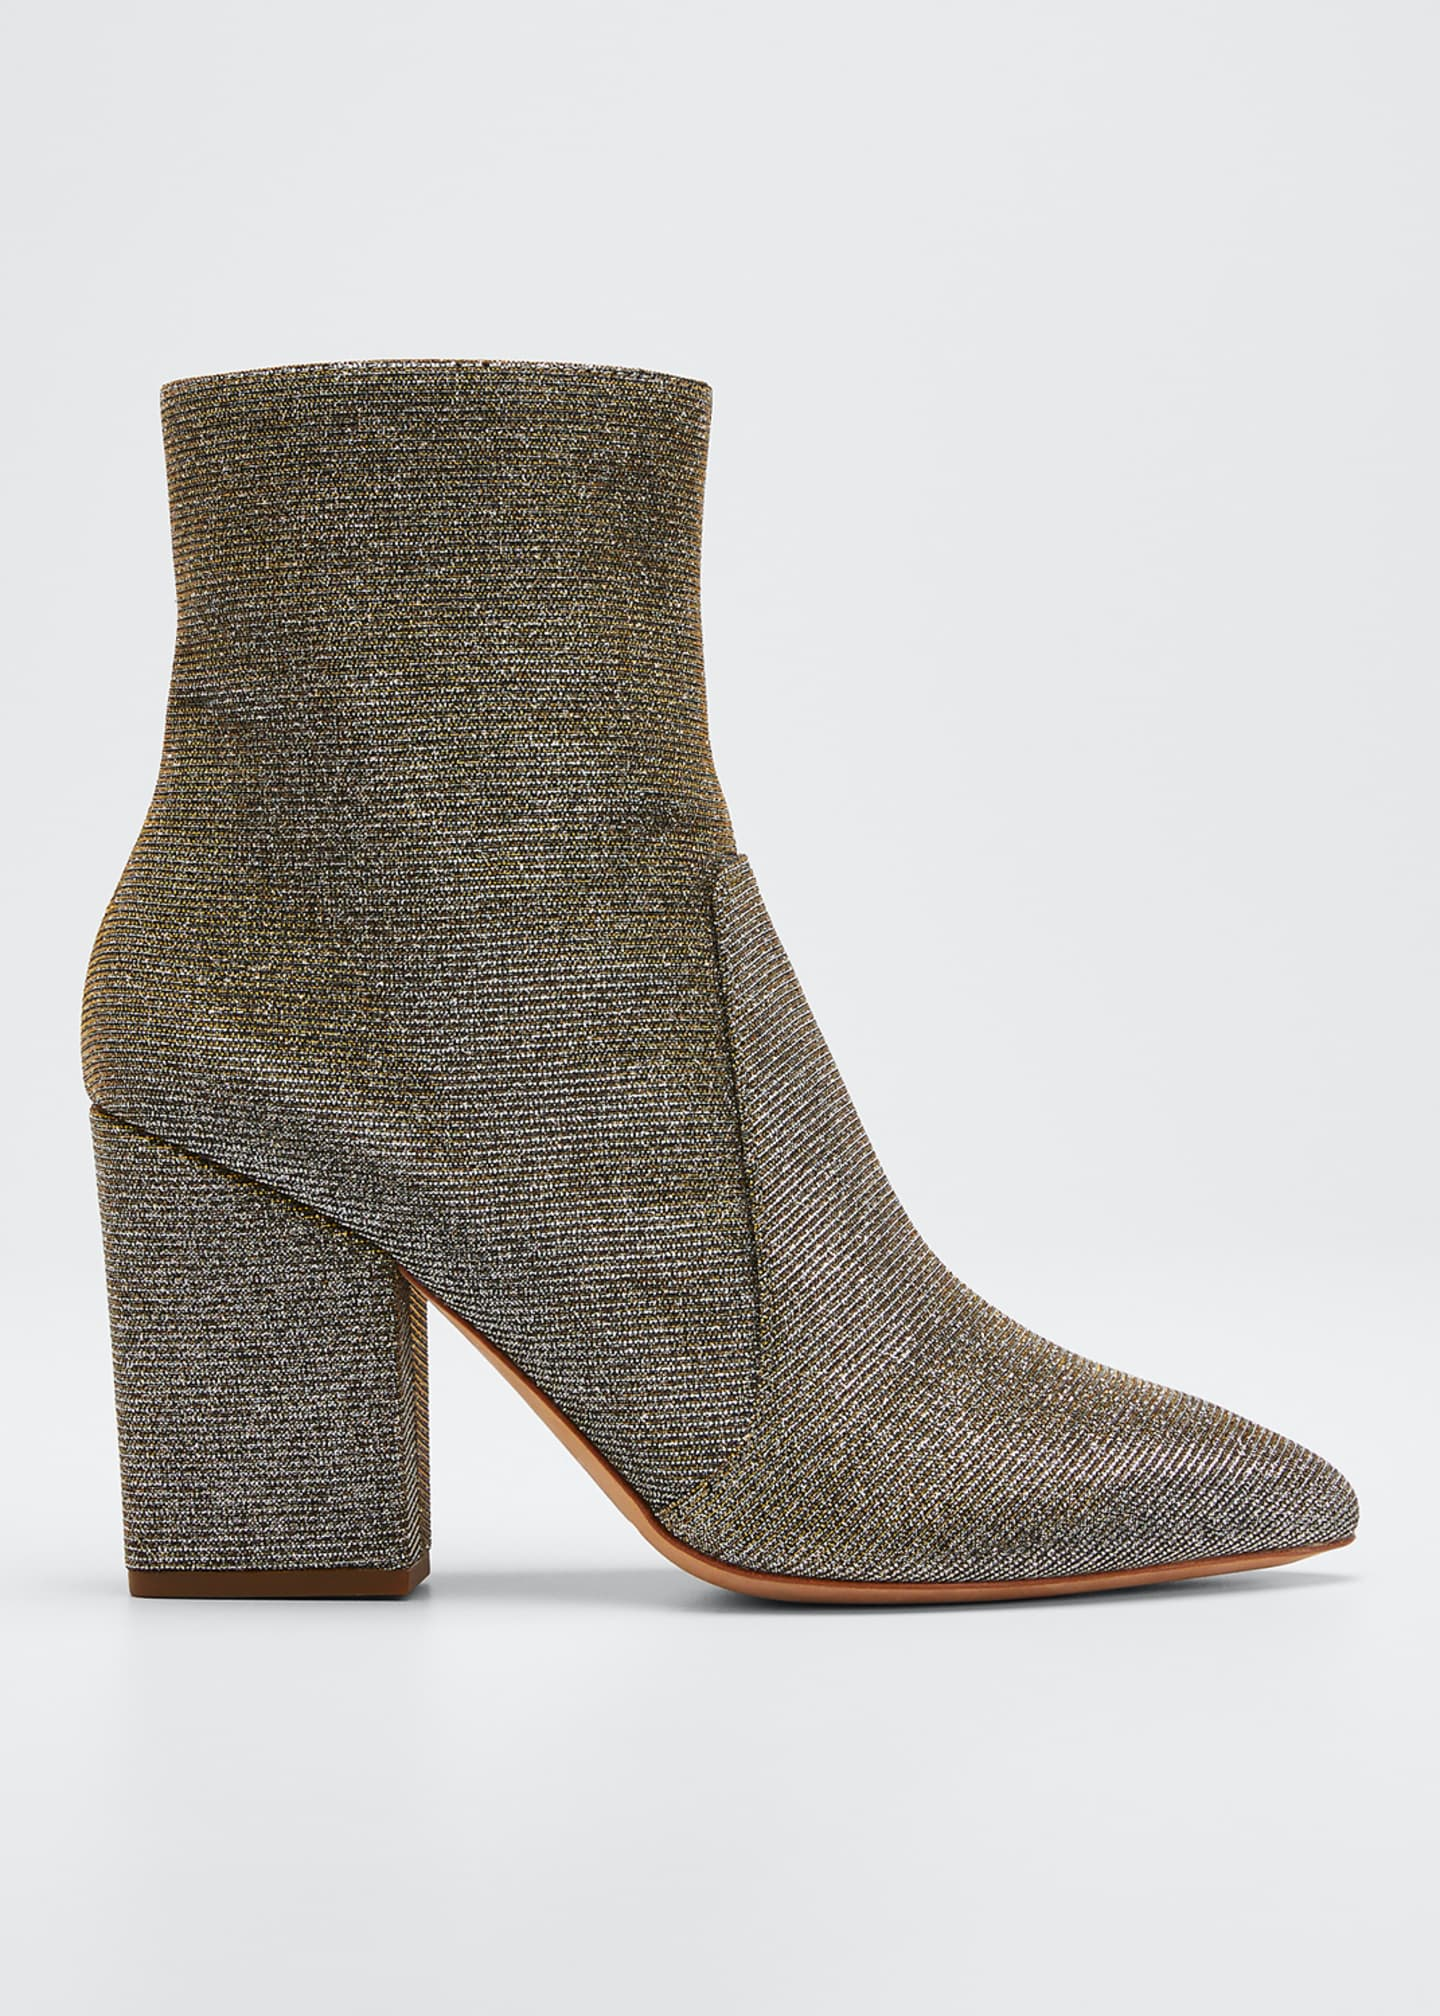 Loeffler Randall Isla Slim Ankle Boots